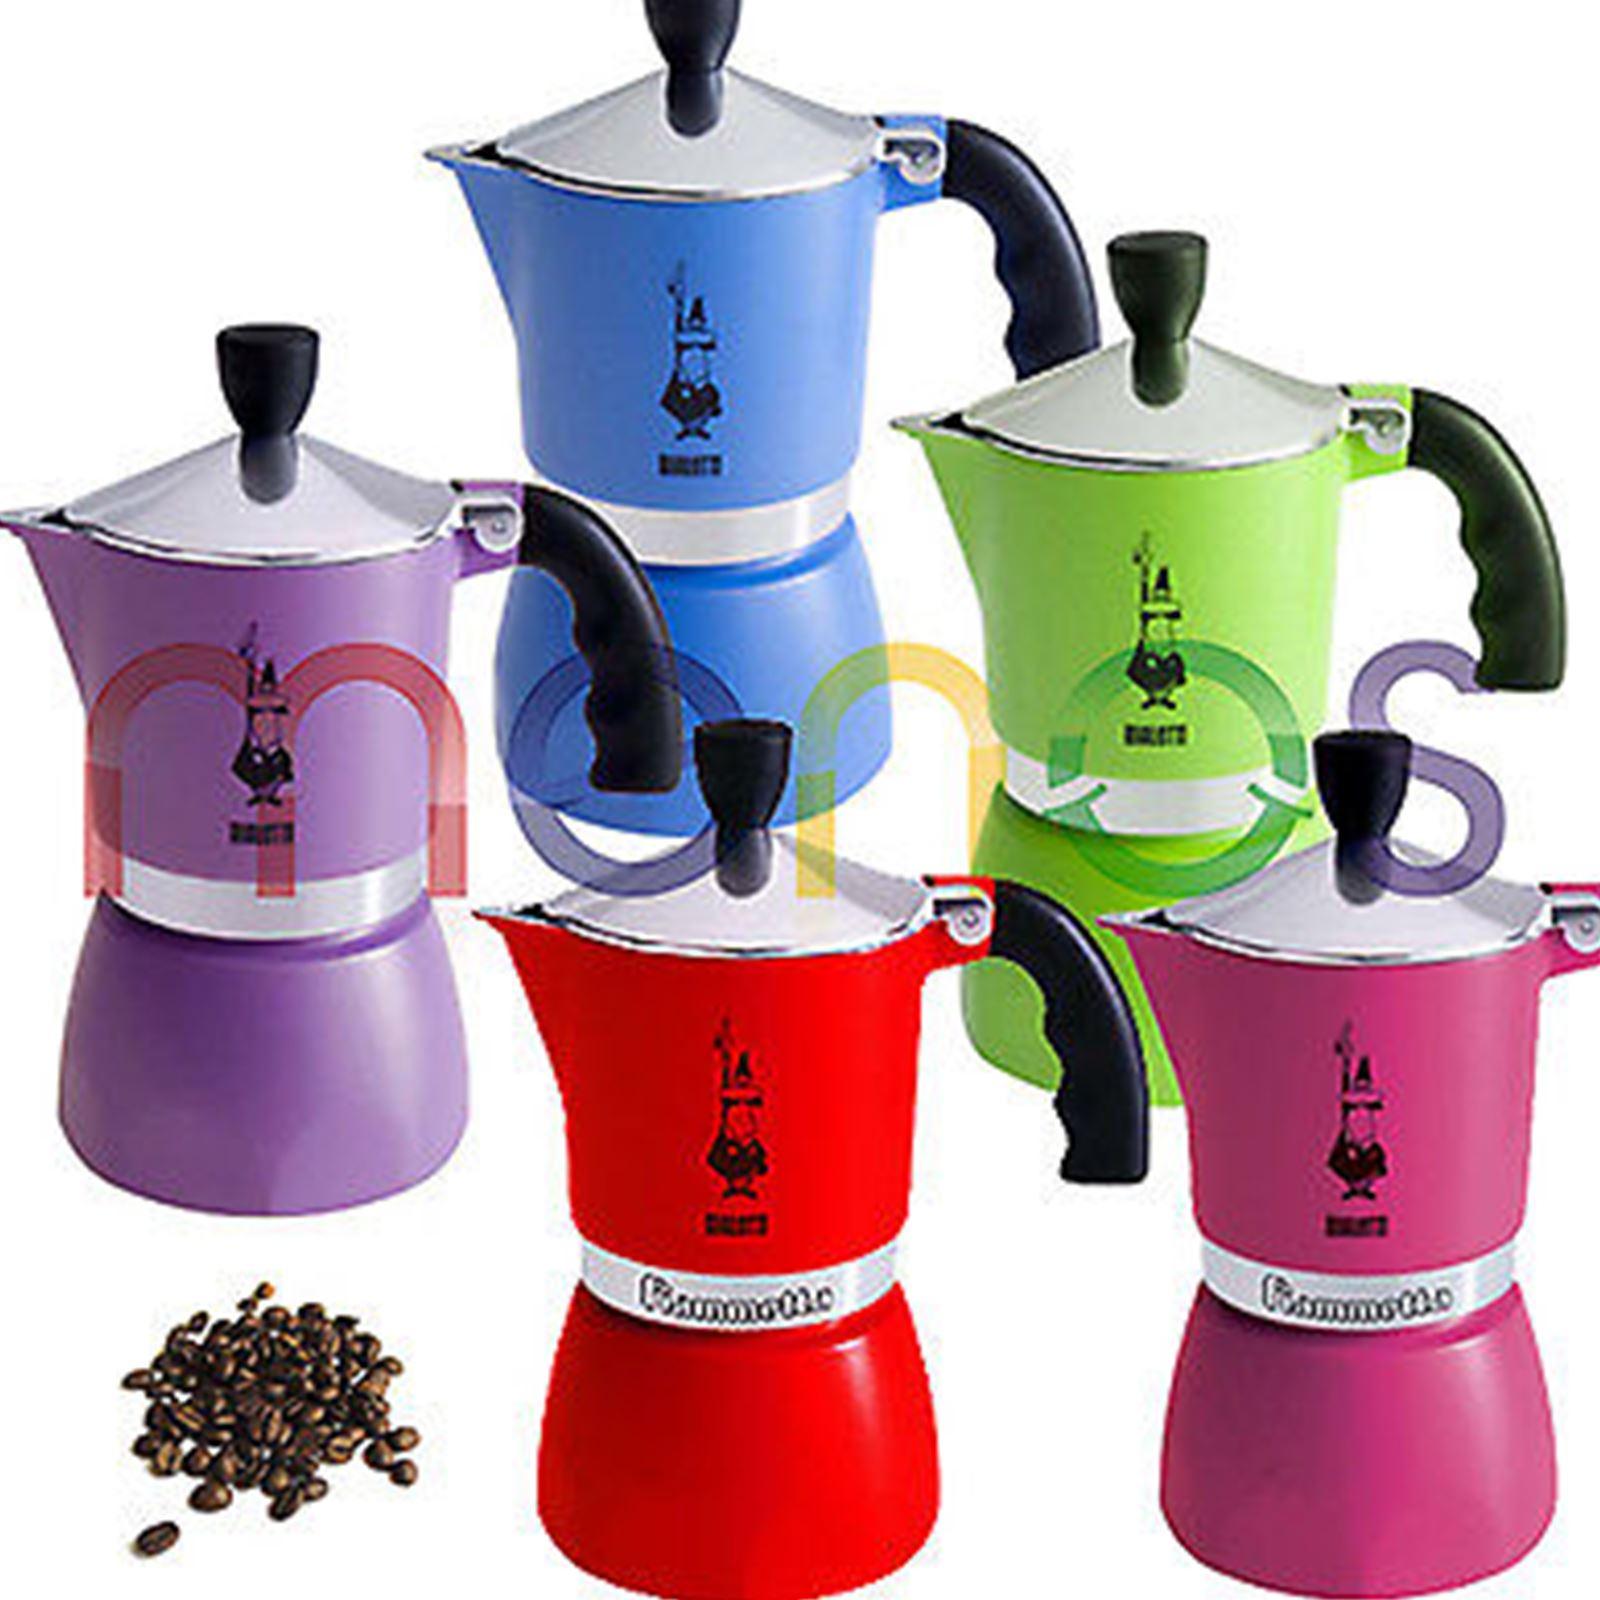 Coffee Maker Made In England : Bialetti Fiammetta 3 Cup Stove Top Italian Espresso Coffee Maker / Moka Pot eBay